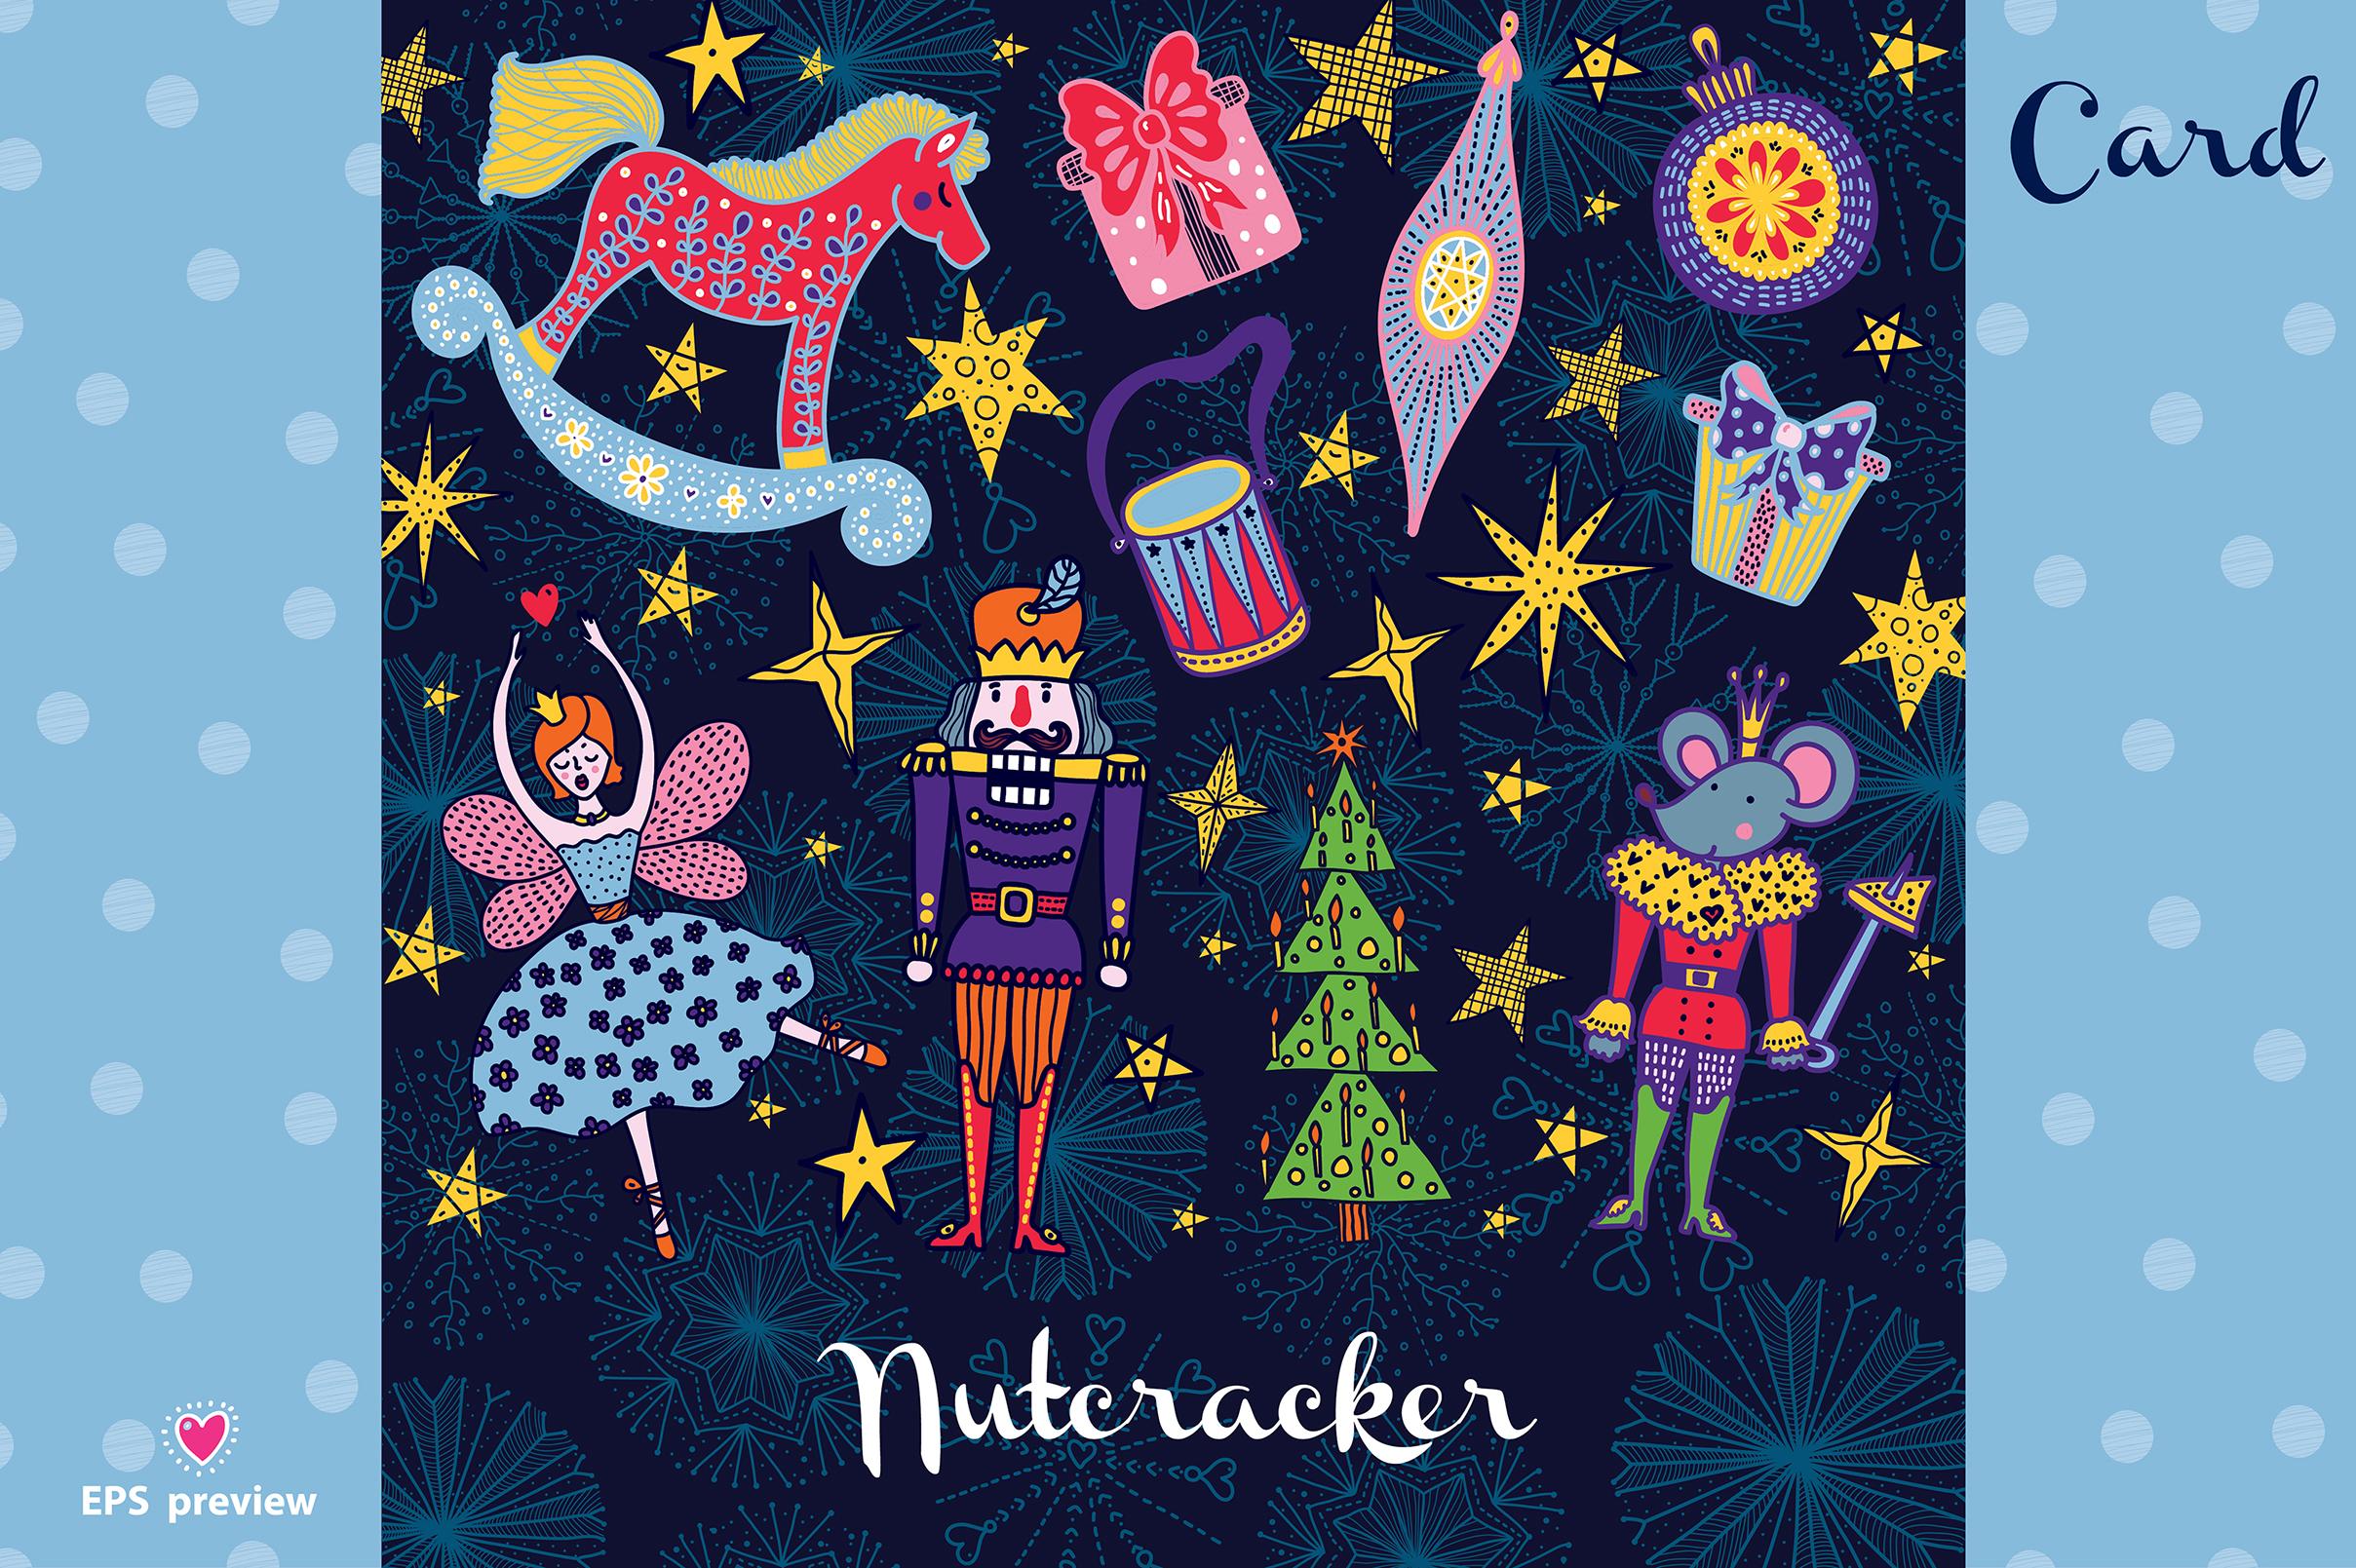 Nutcracker. Christmas story. example image 13